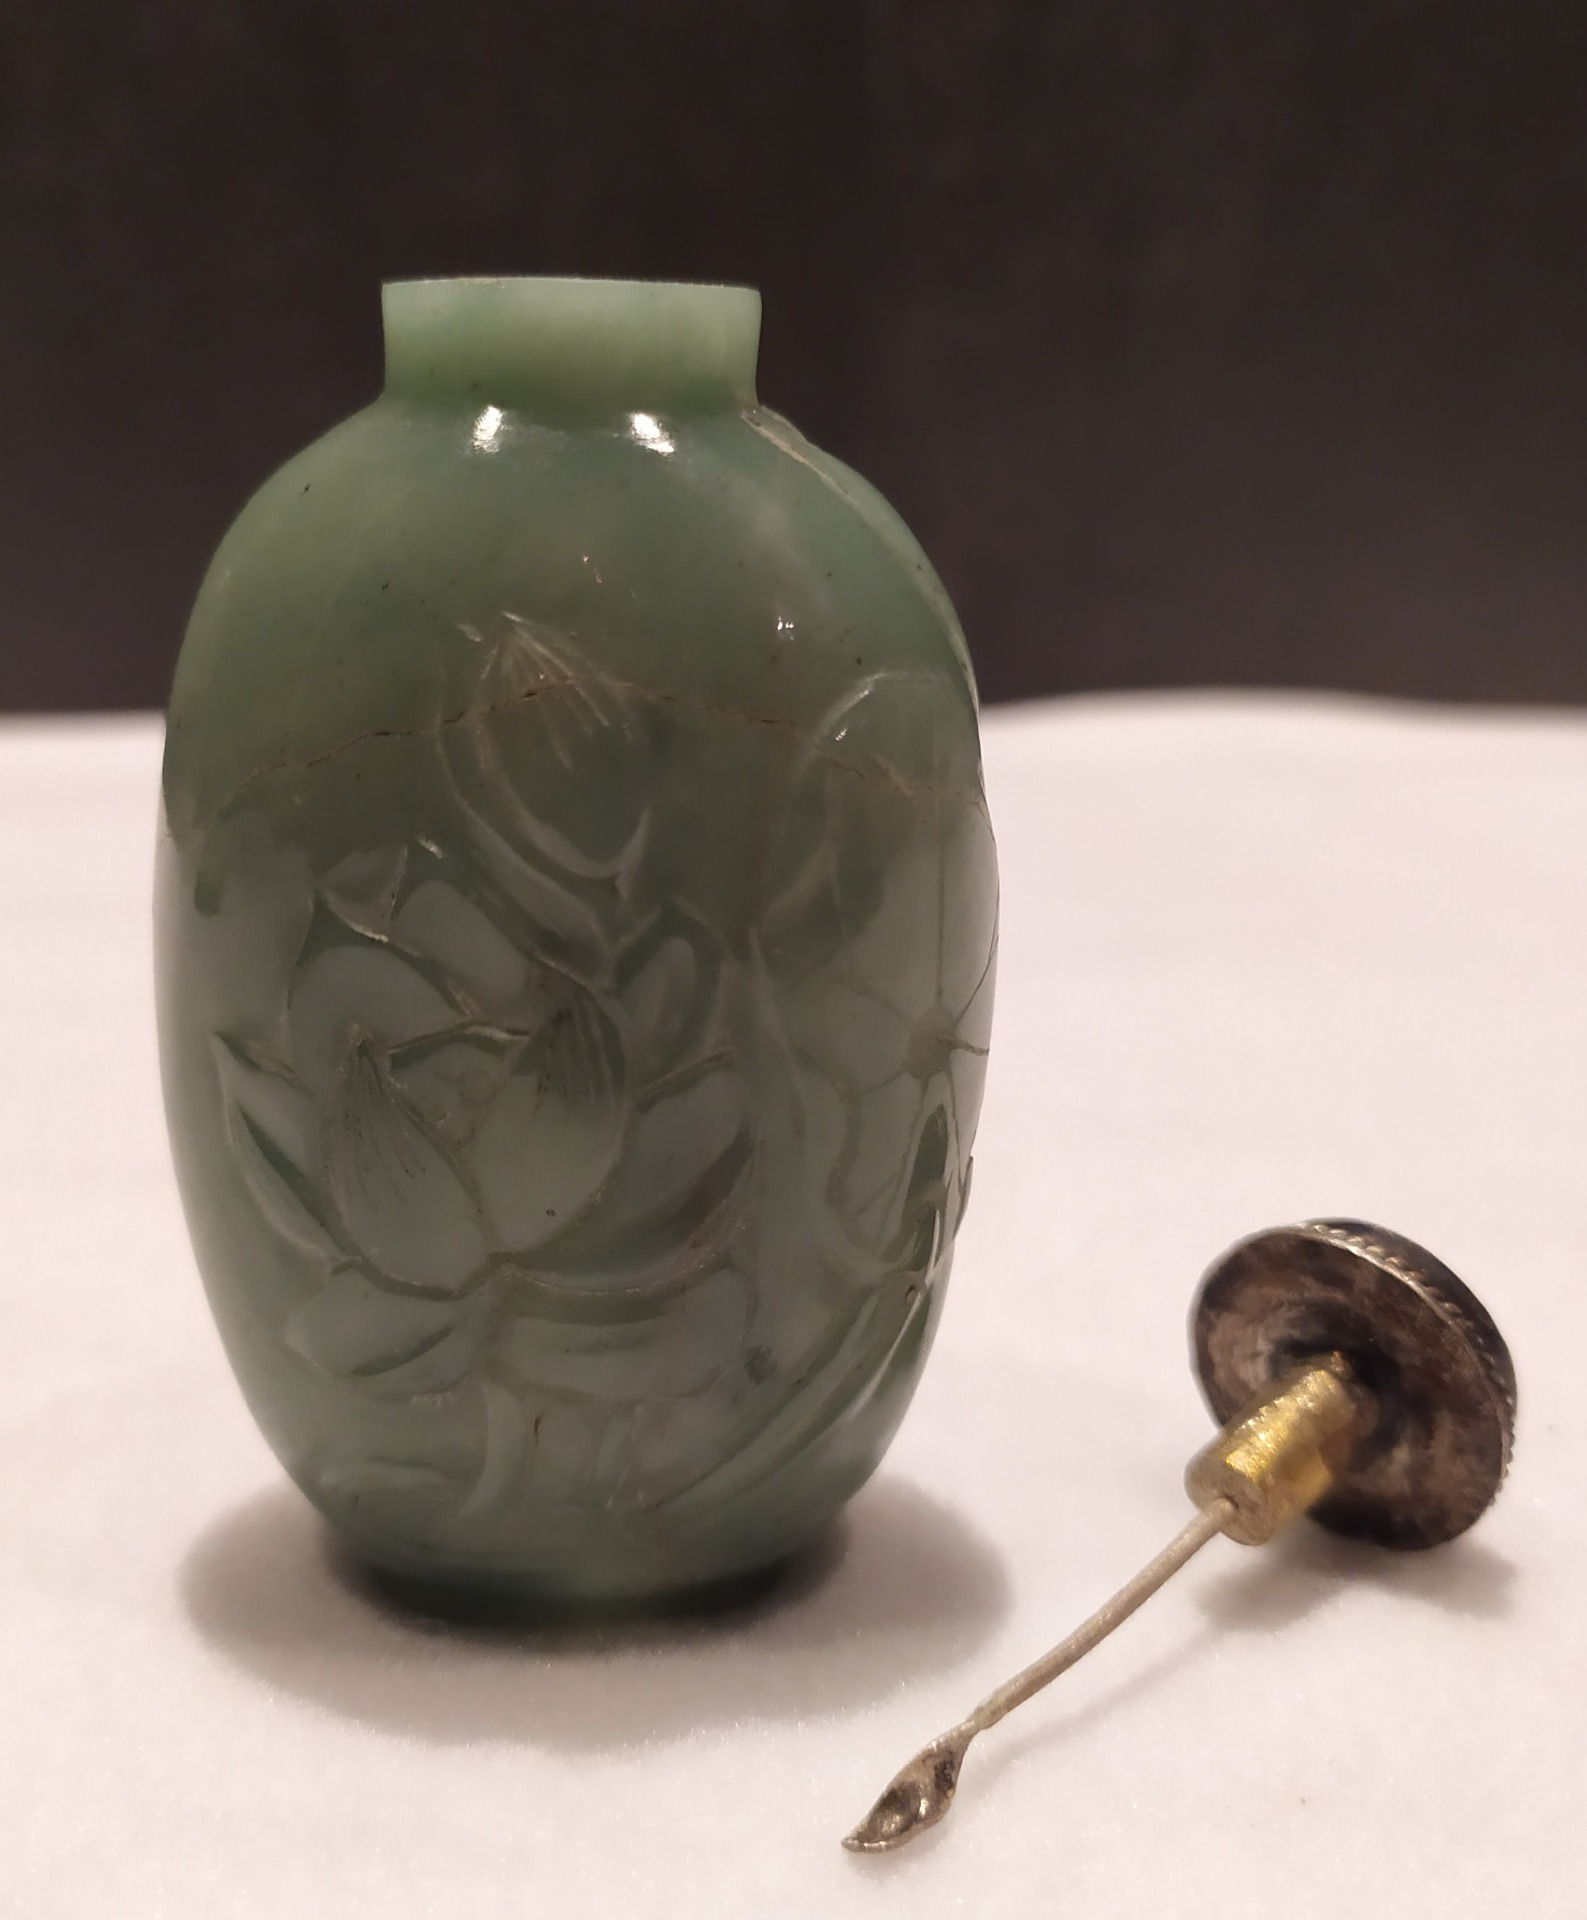 thumb6|Snuff bottle, porta tabacco fiuto, giada verde motivi floreali, Cina XX secolo